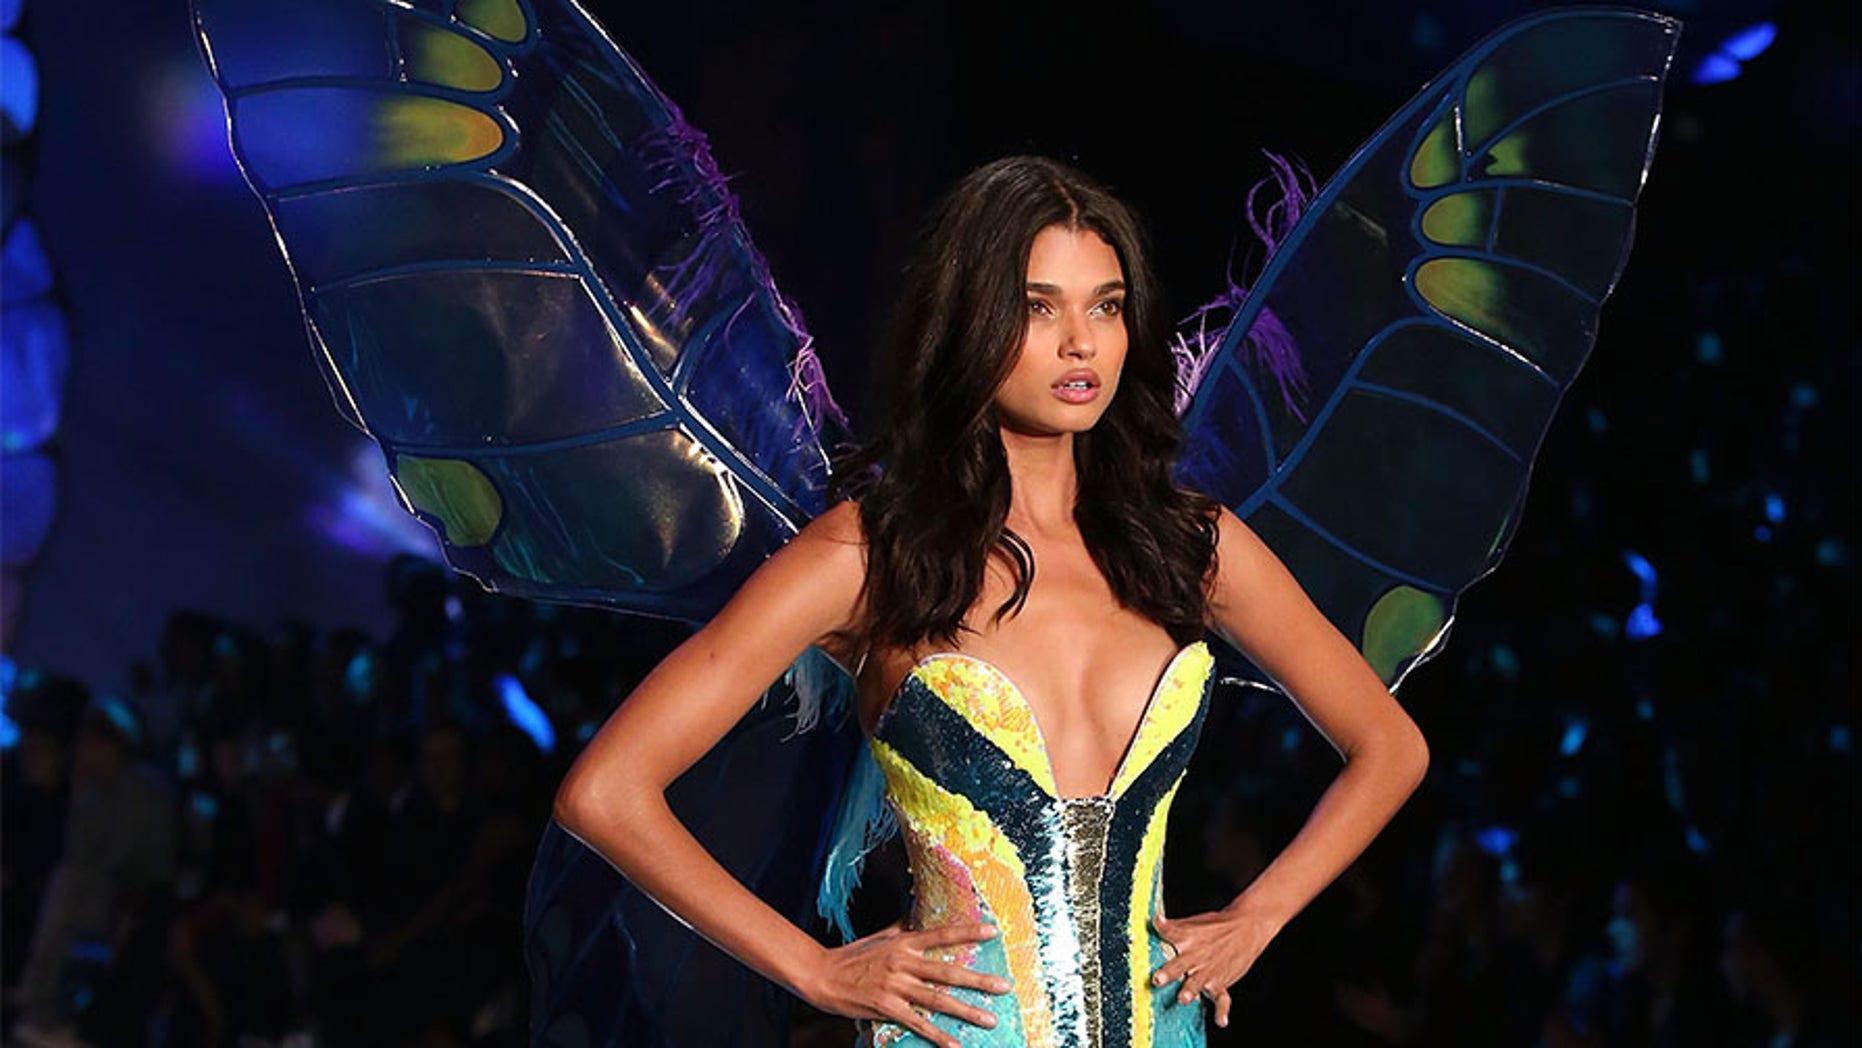 Victorias Secret Model Daniela Braga Says She Arrived To New York